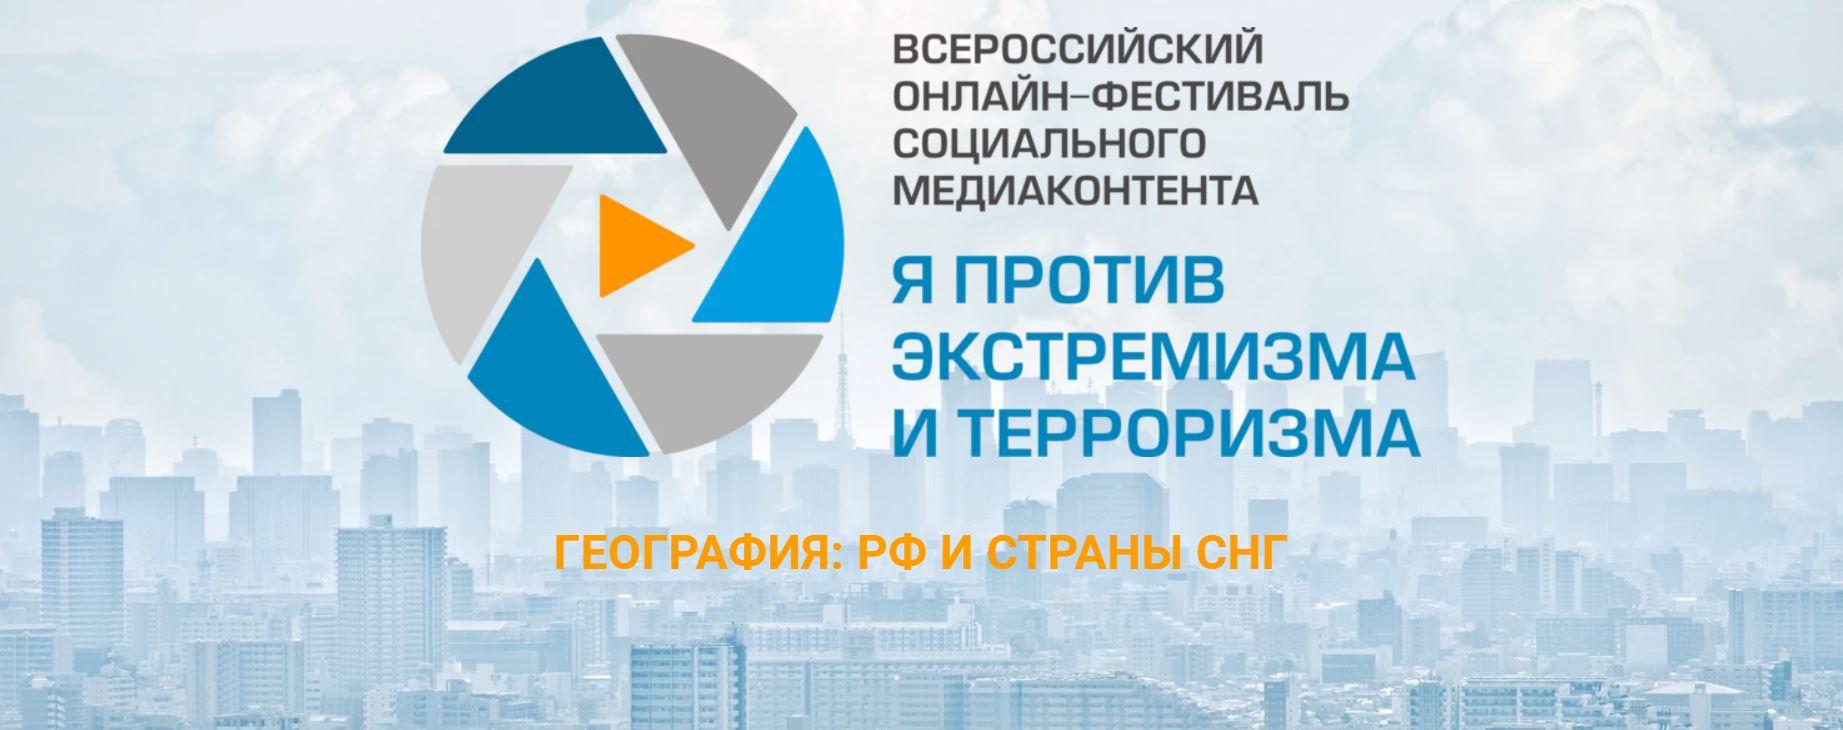 Начинается прием заявок на онлайн-фестиваль «Я против экстремизма и терроризма»